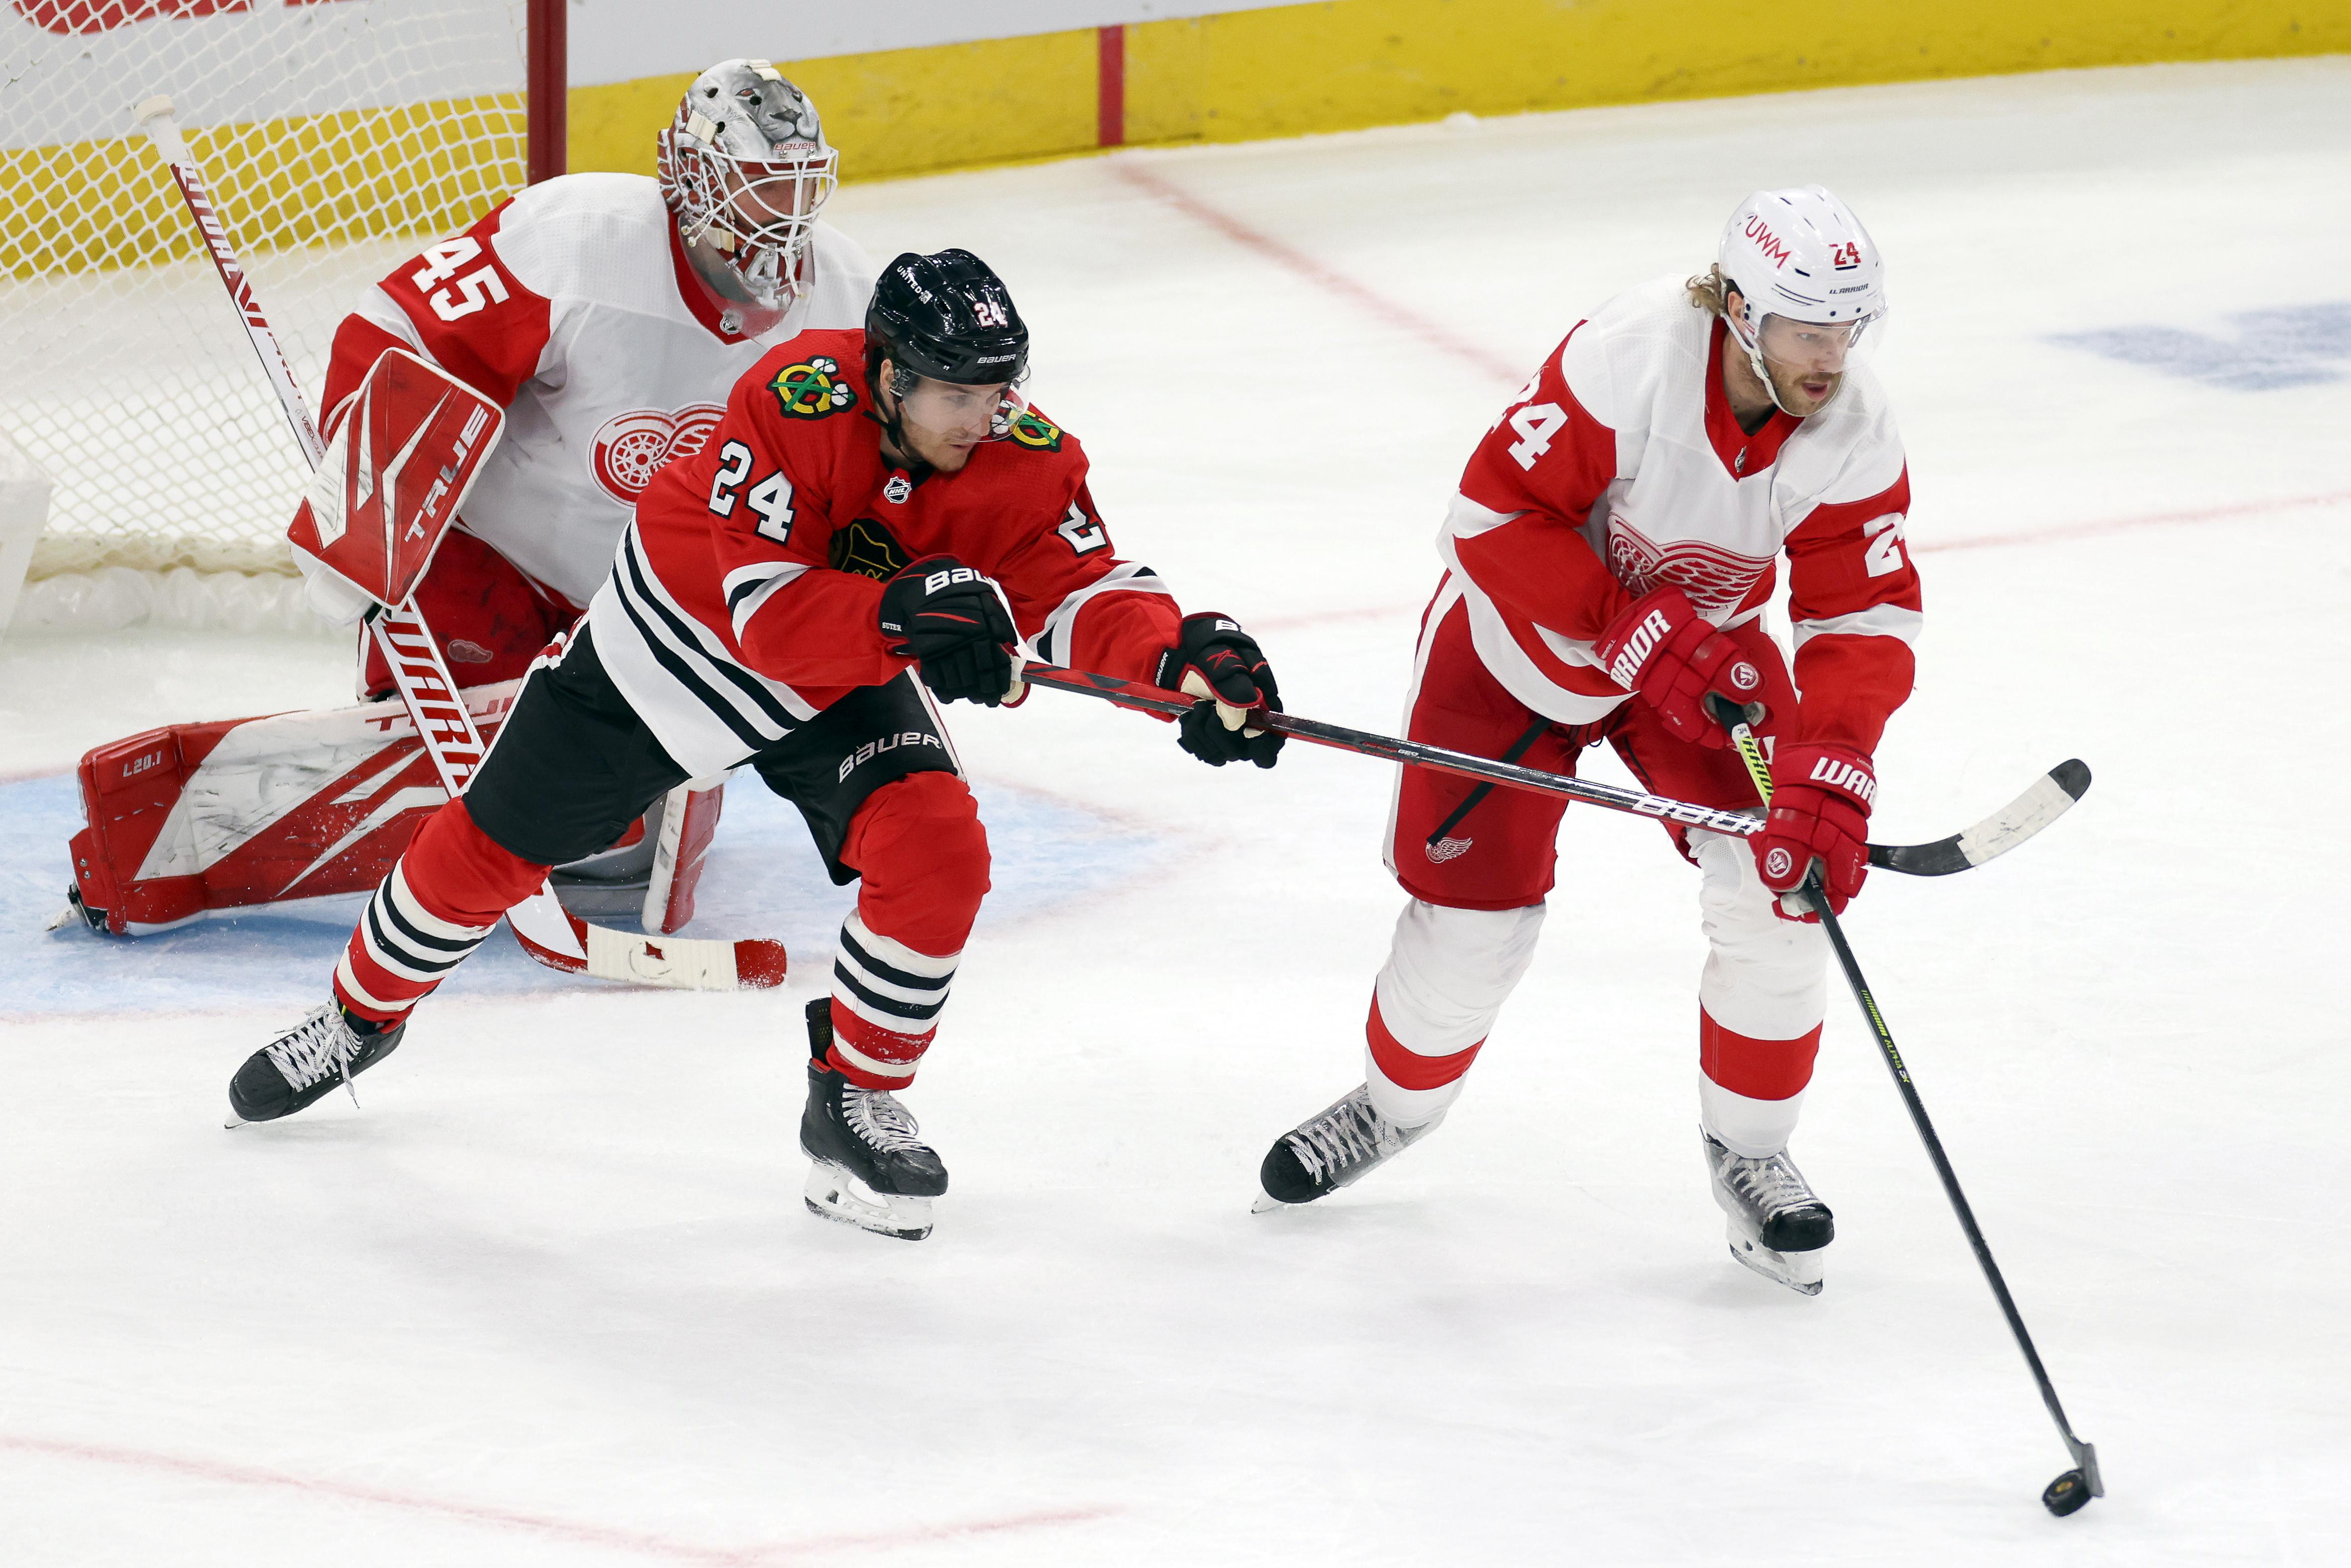 NHL: FEB 27 Red Wings at Blackhawks